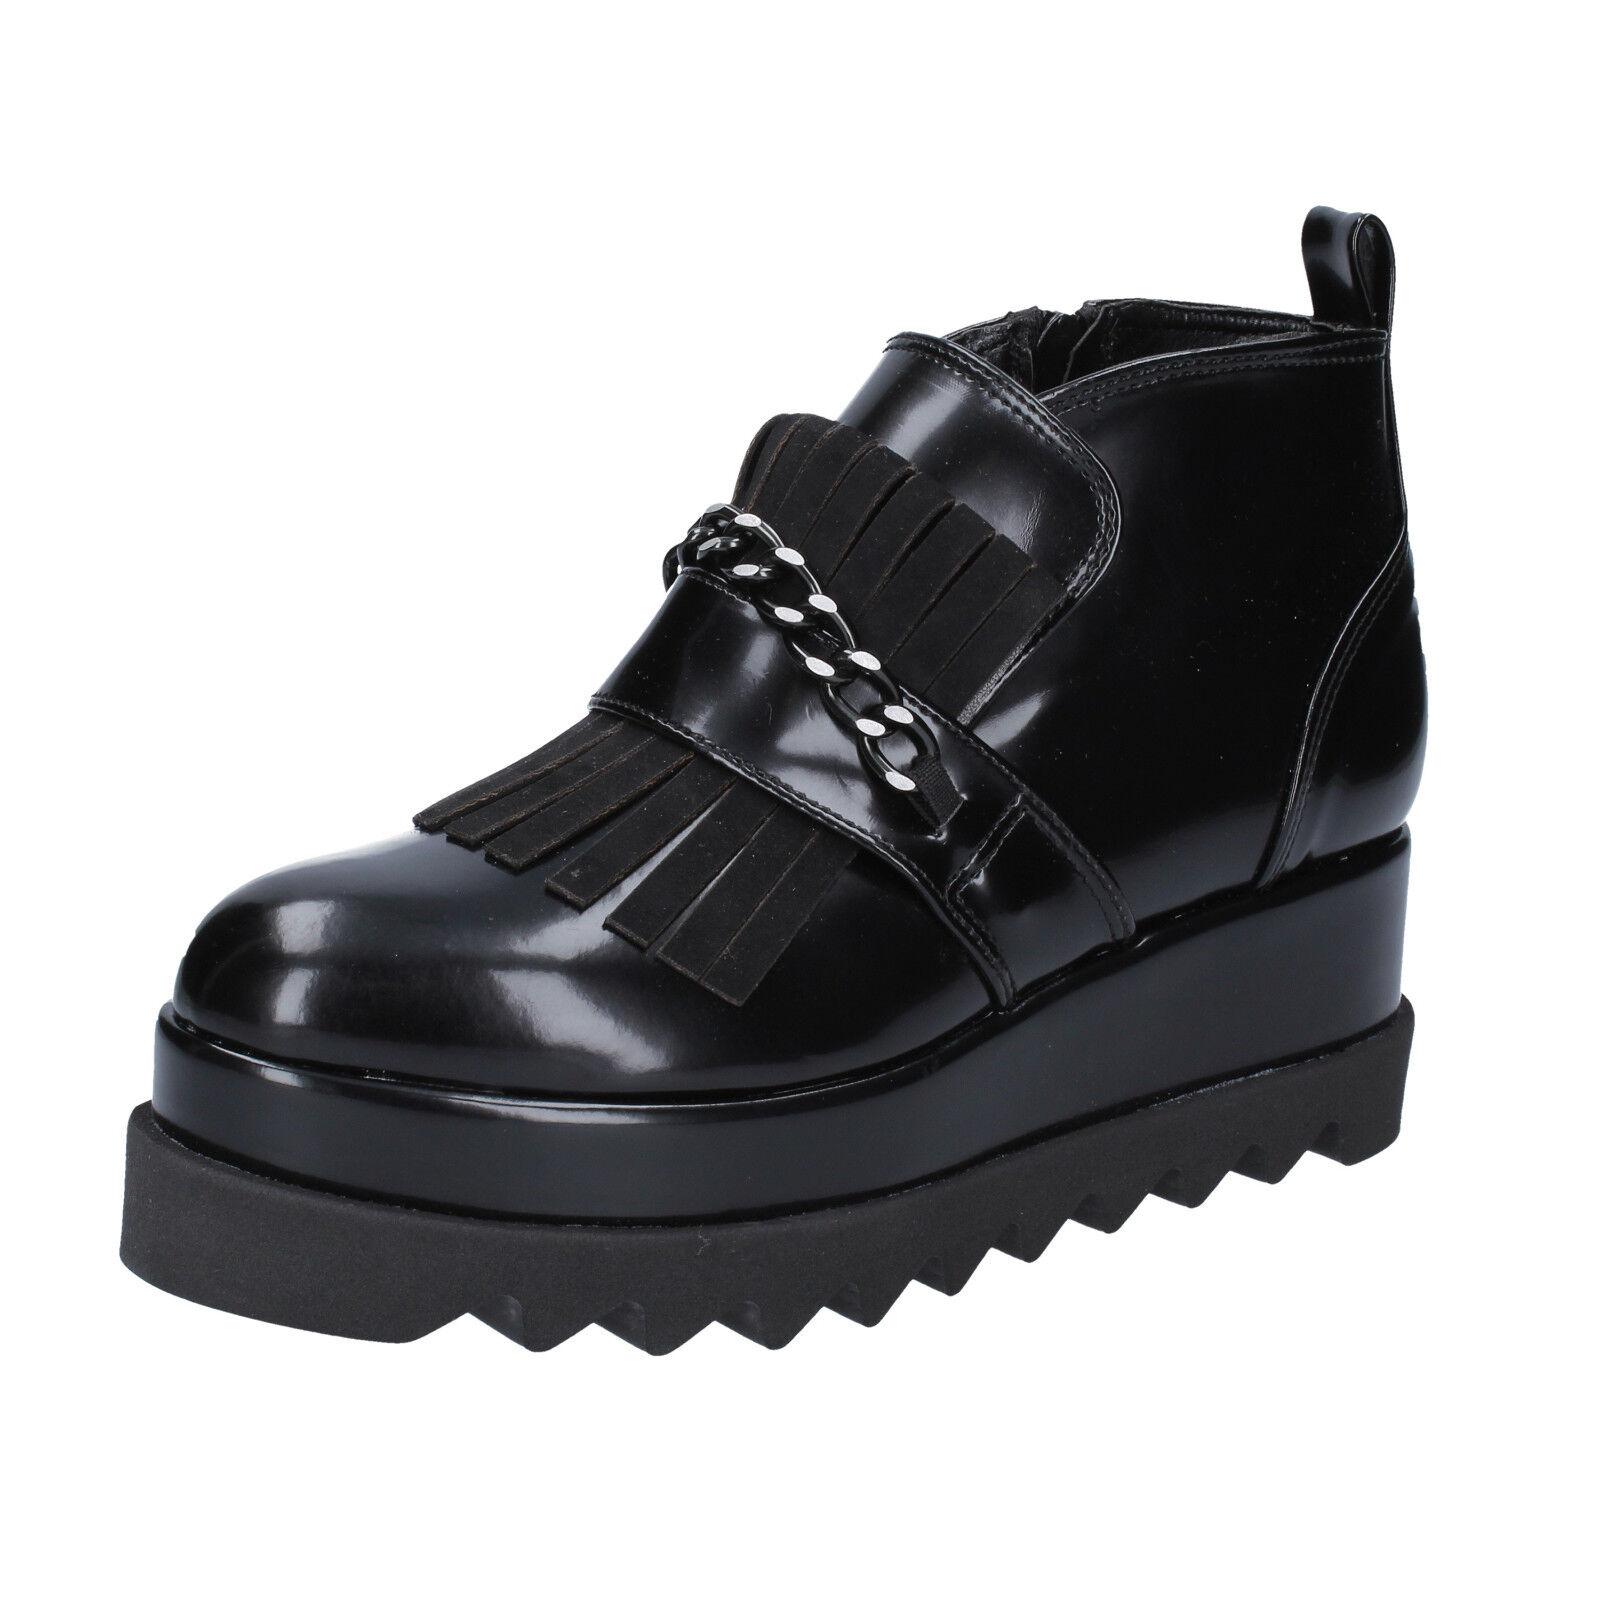 Zapatos señora olga Burini 36 UE botines elegante cuero negro bx782-36